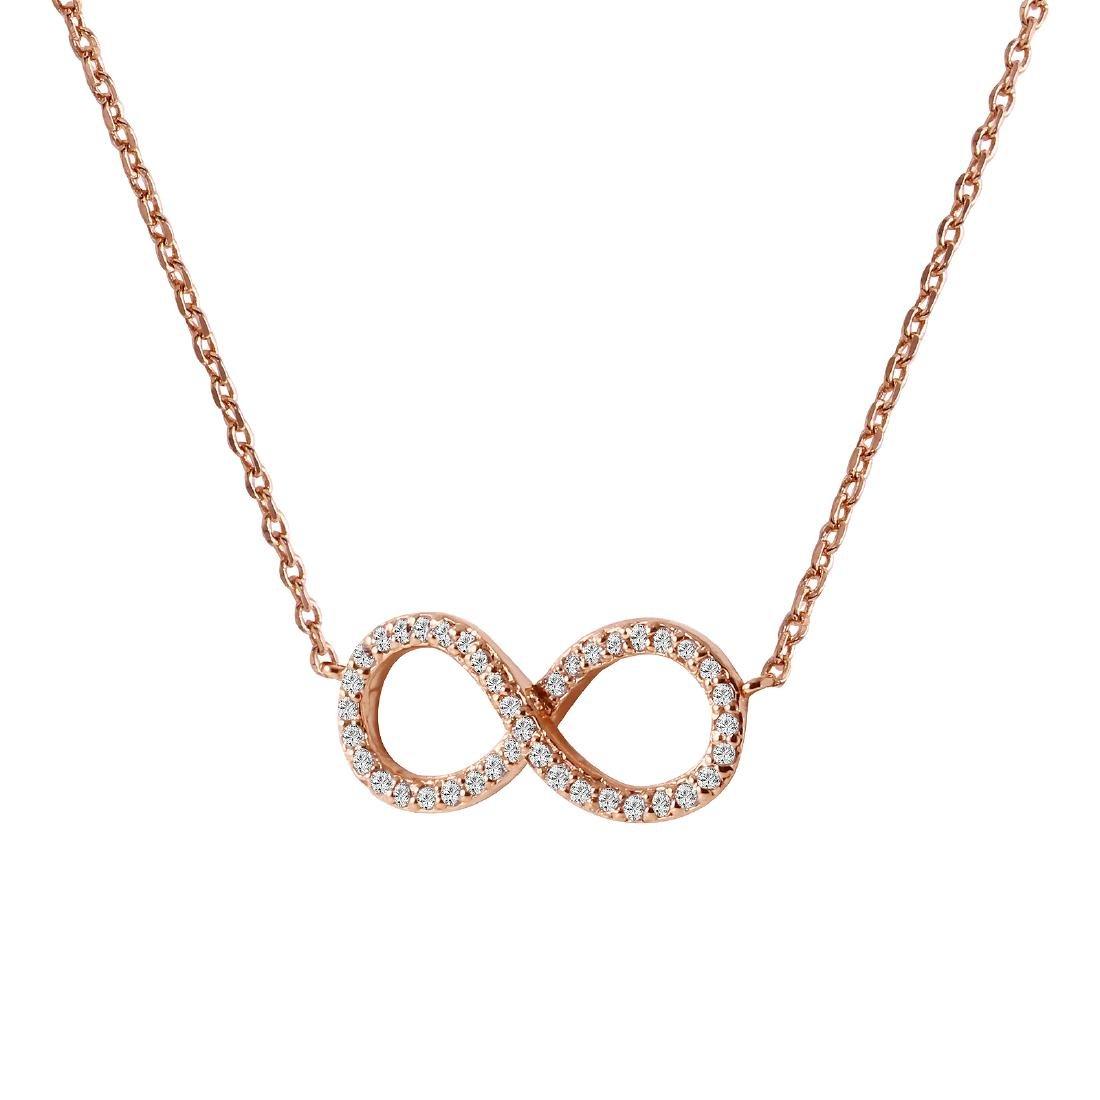 0.18 Carat Natural Diamond 18K Solid Rose Gold Necklace - 2